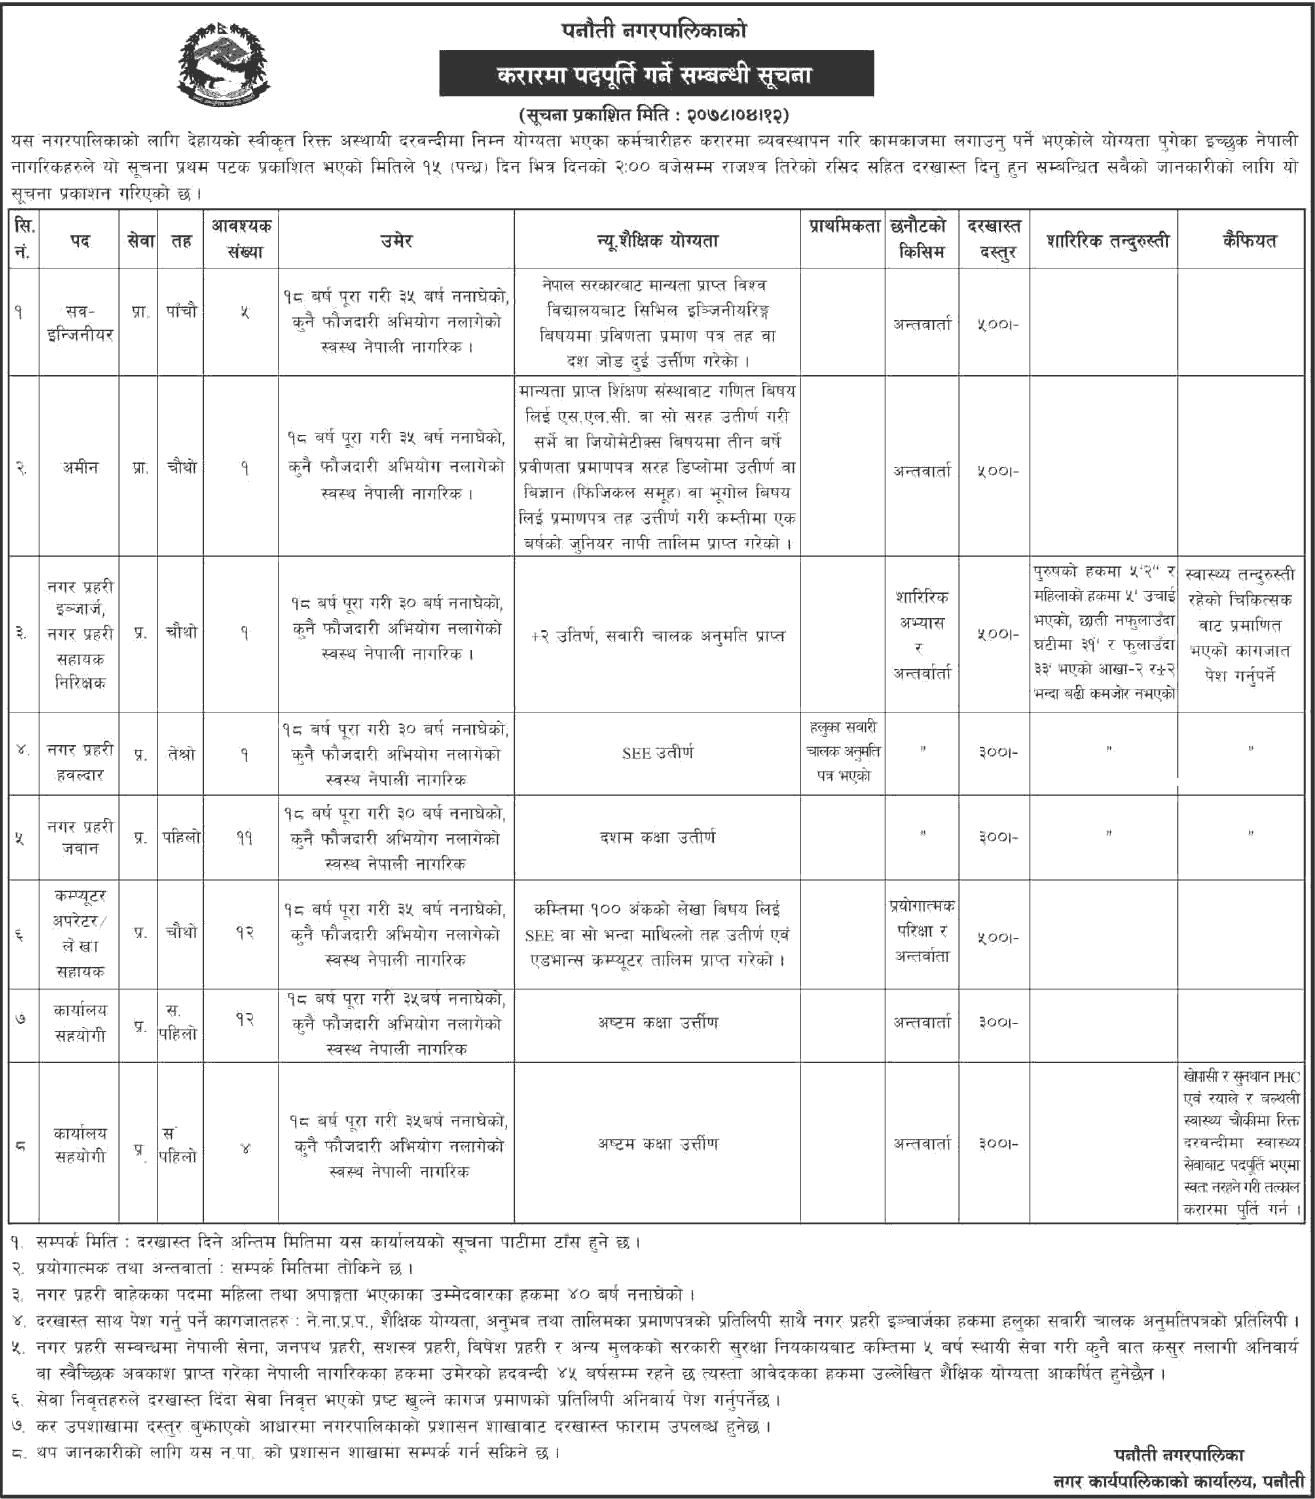 Panauti Municipality Job Vacancy Announcement for Various Post